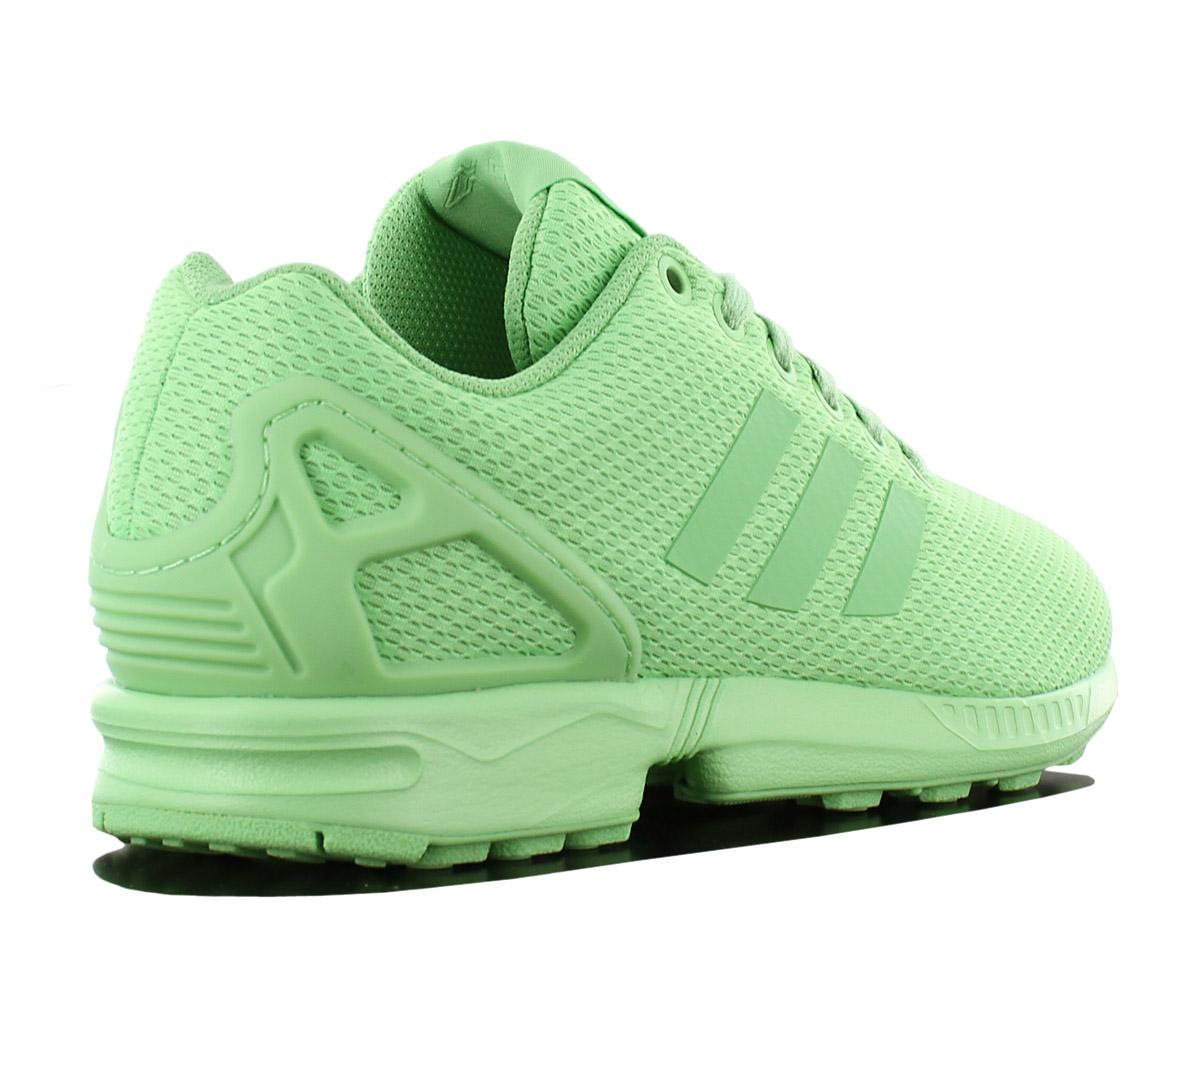 1c7b150208c4 Adidas Originals Zx Flux W Ladies Sneaker Shoes Green Textile ...